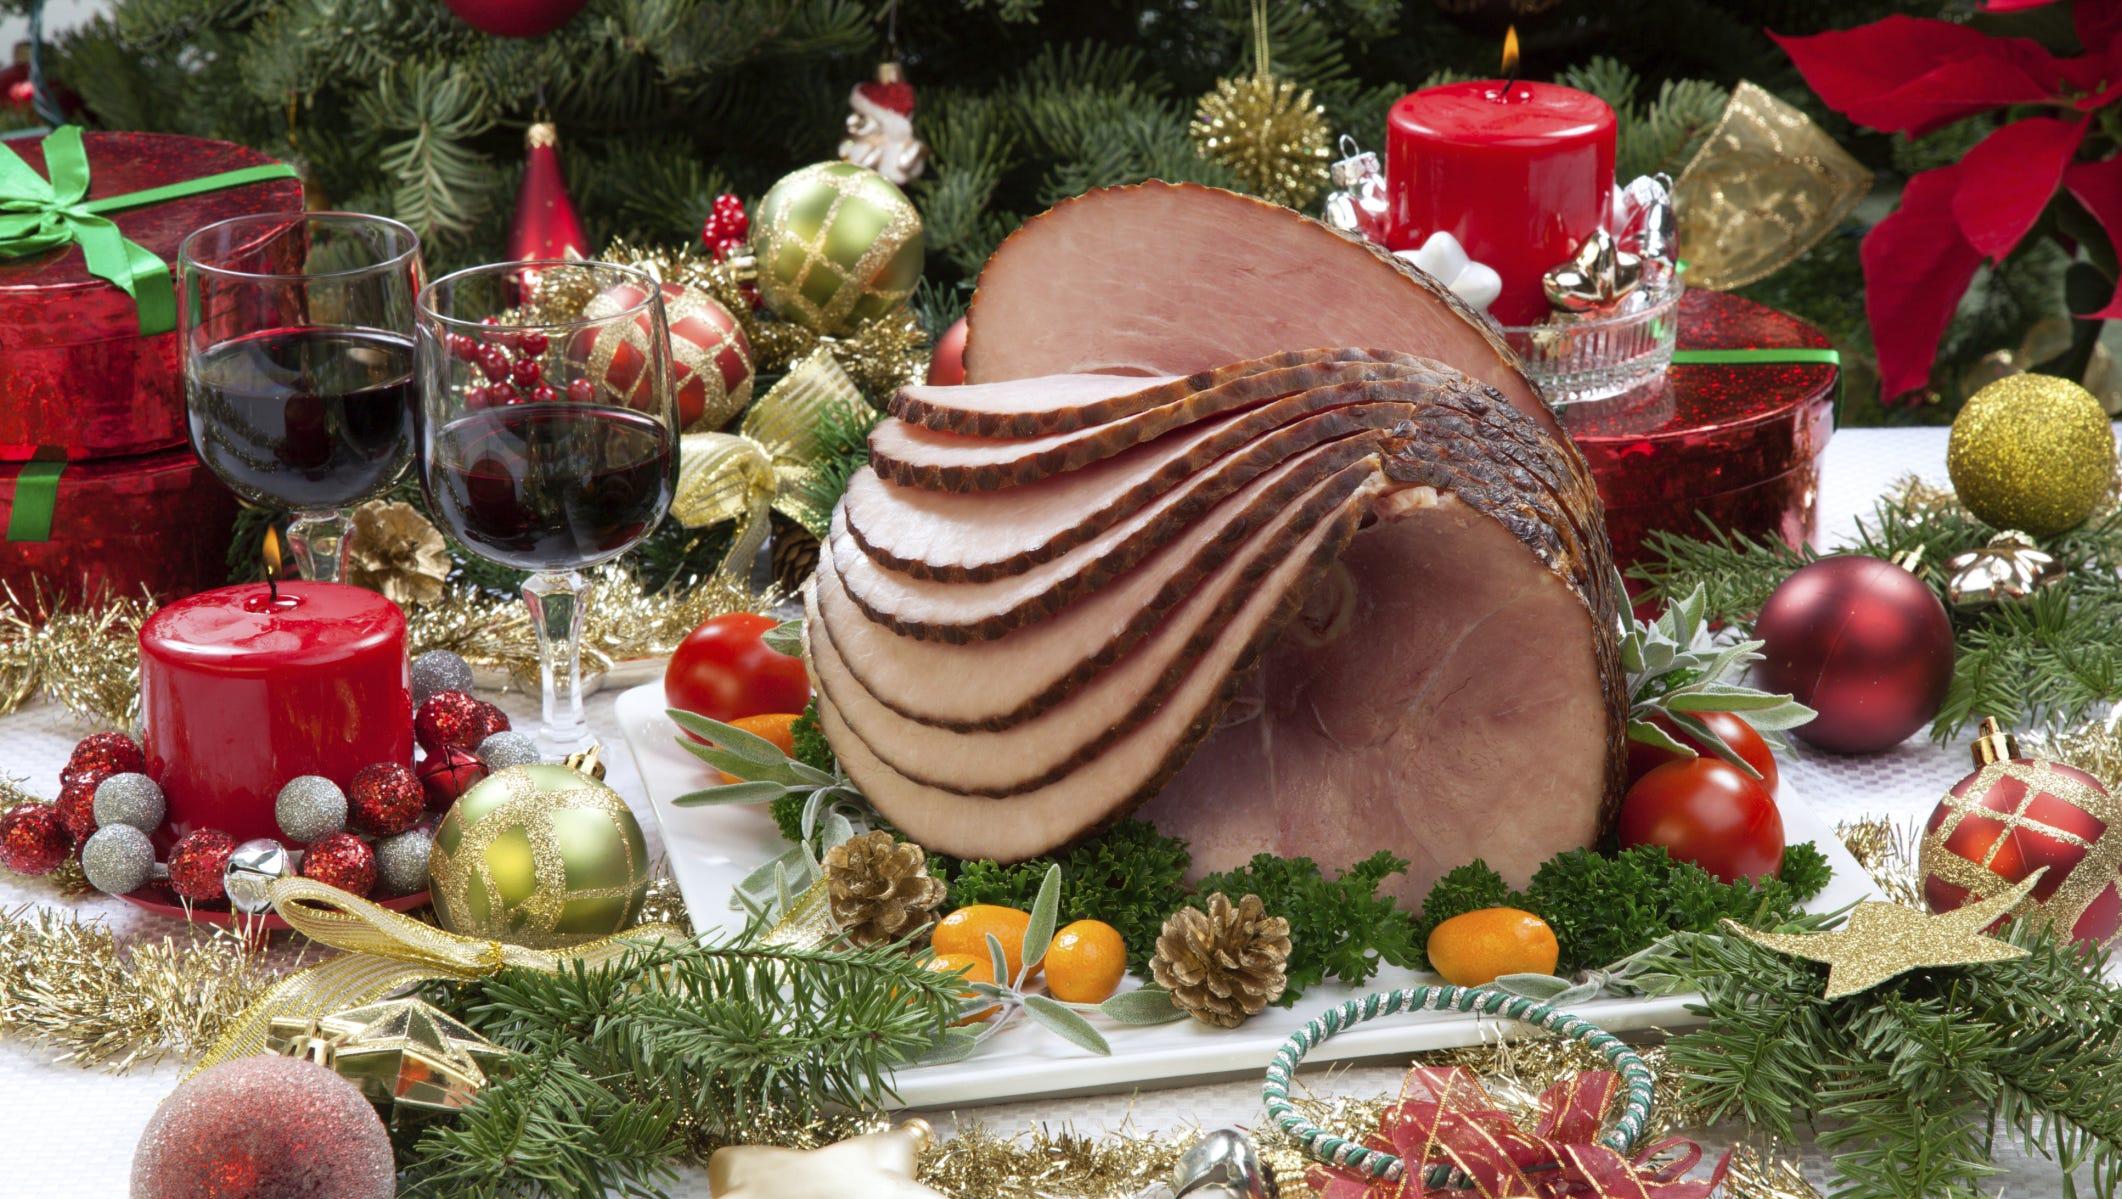 Millcreek Restaurants Open Christmas Day 2020 Restaurants open on Christmas Day